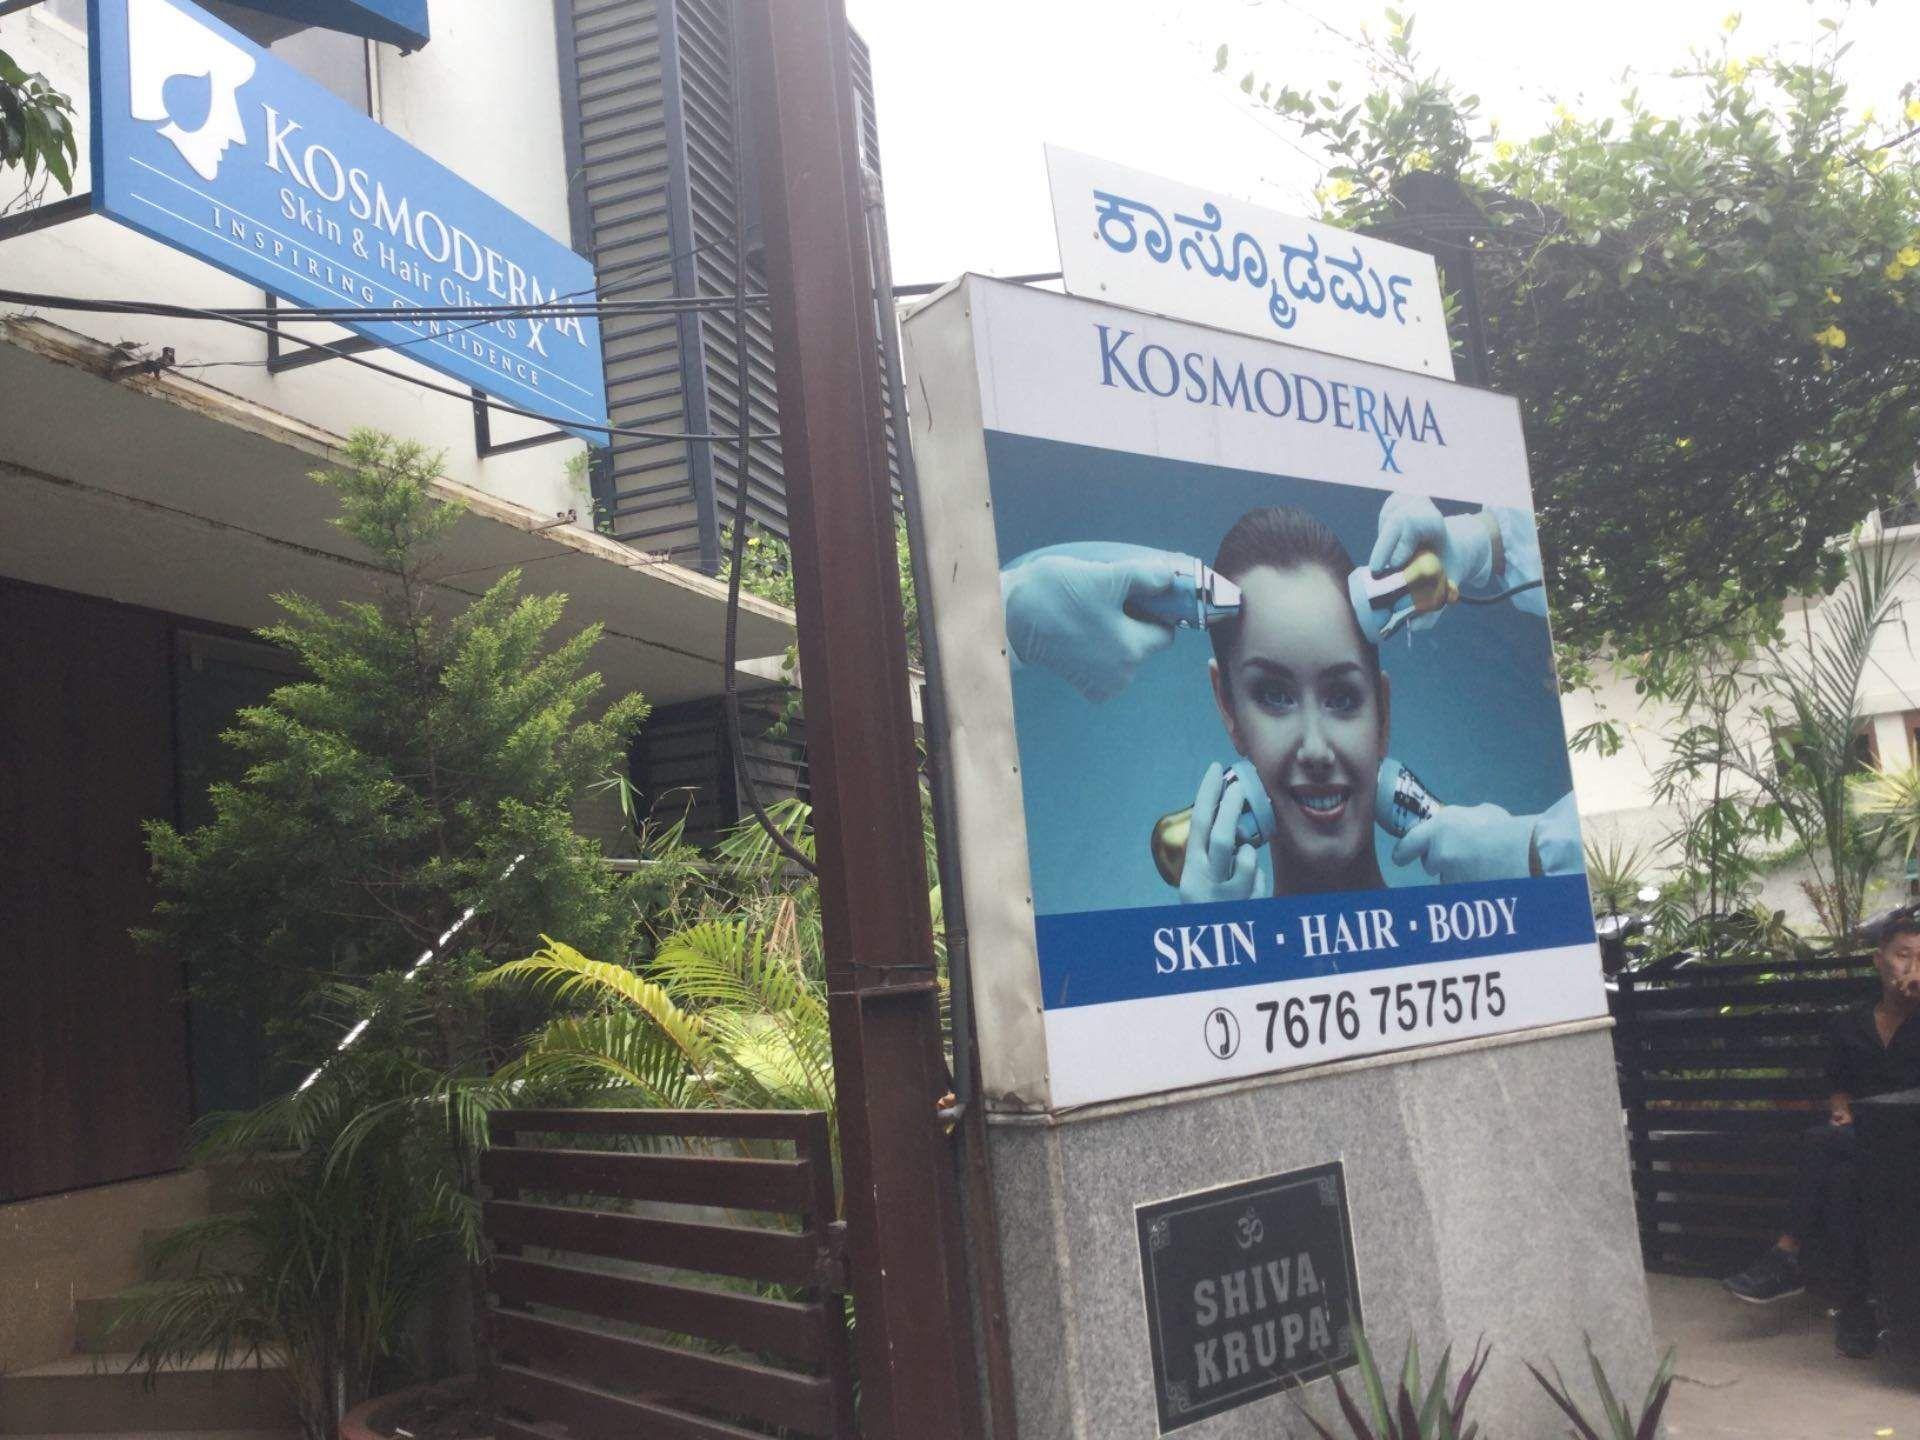 Kosmoderma Bangalore Skin And Hair Clinic Hair Clinic Bangalore